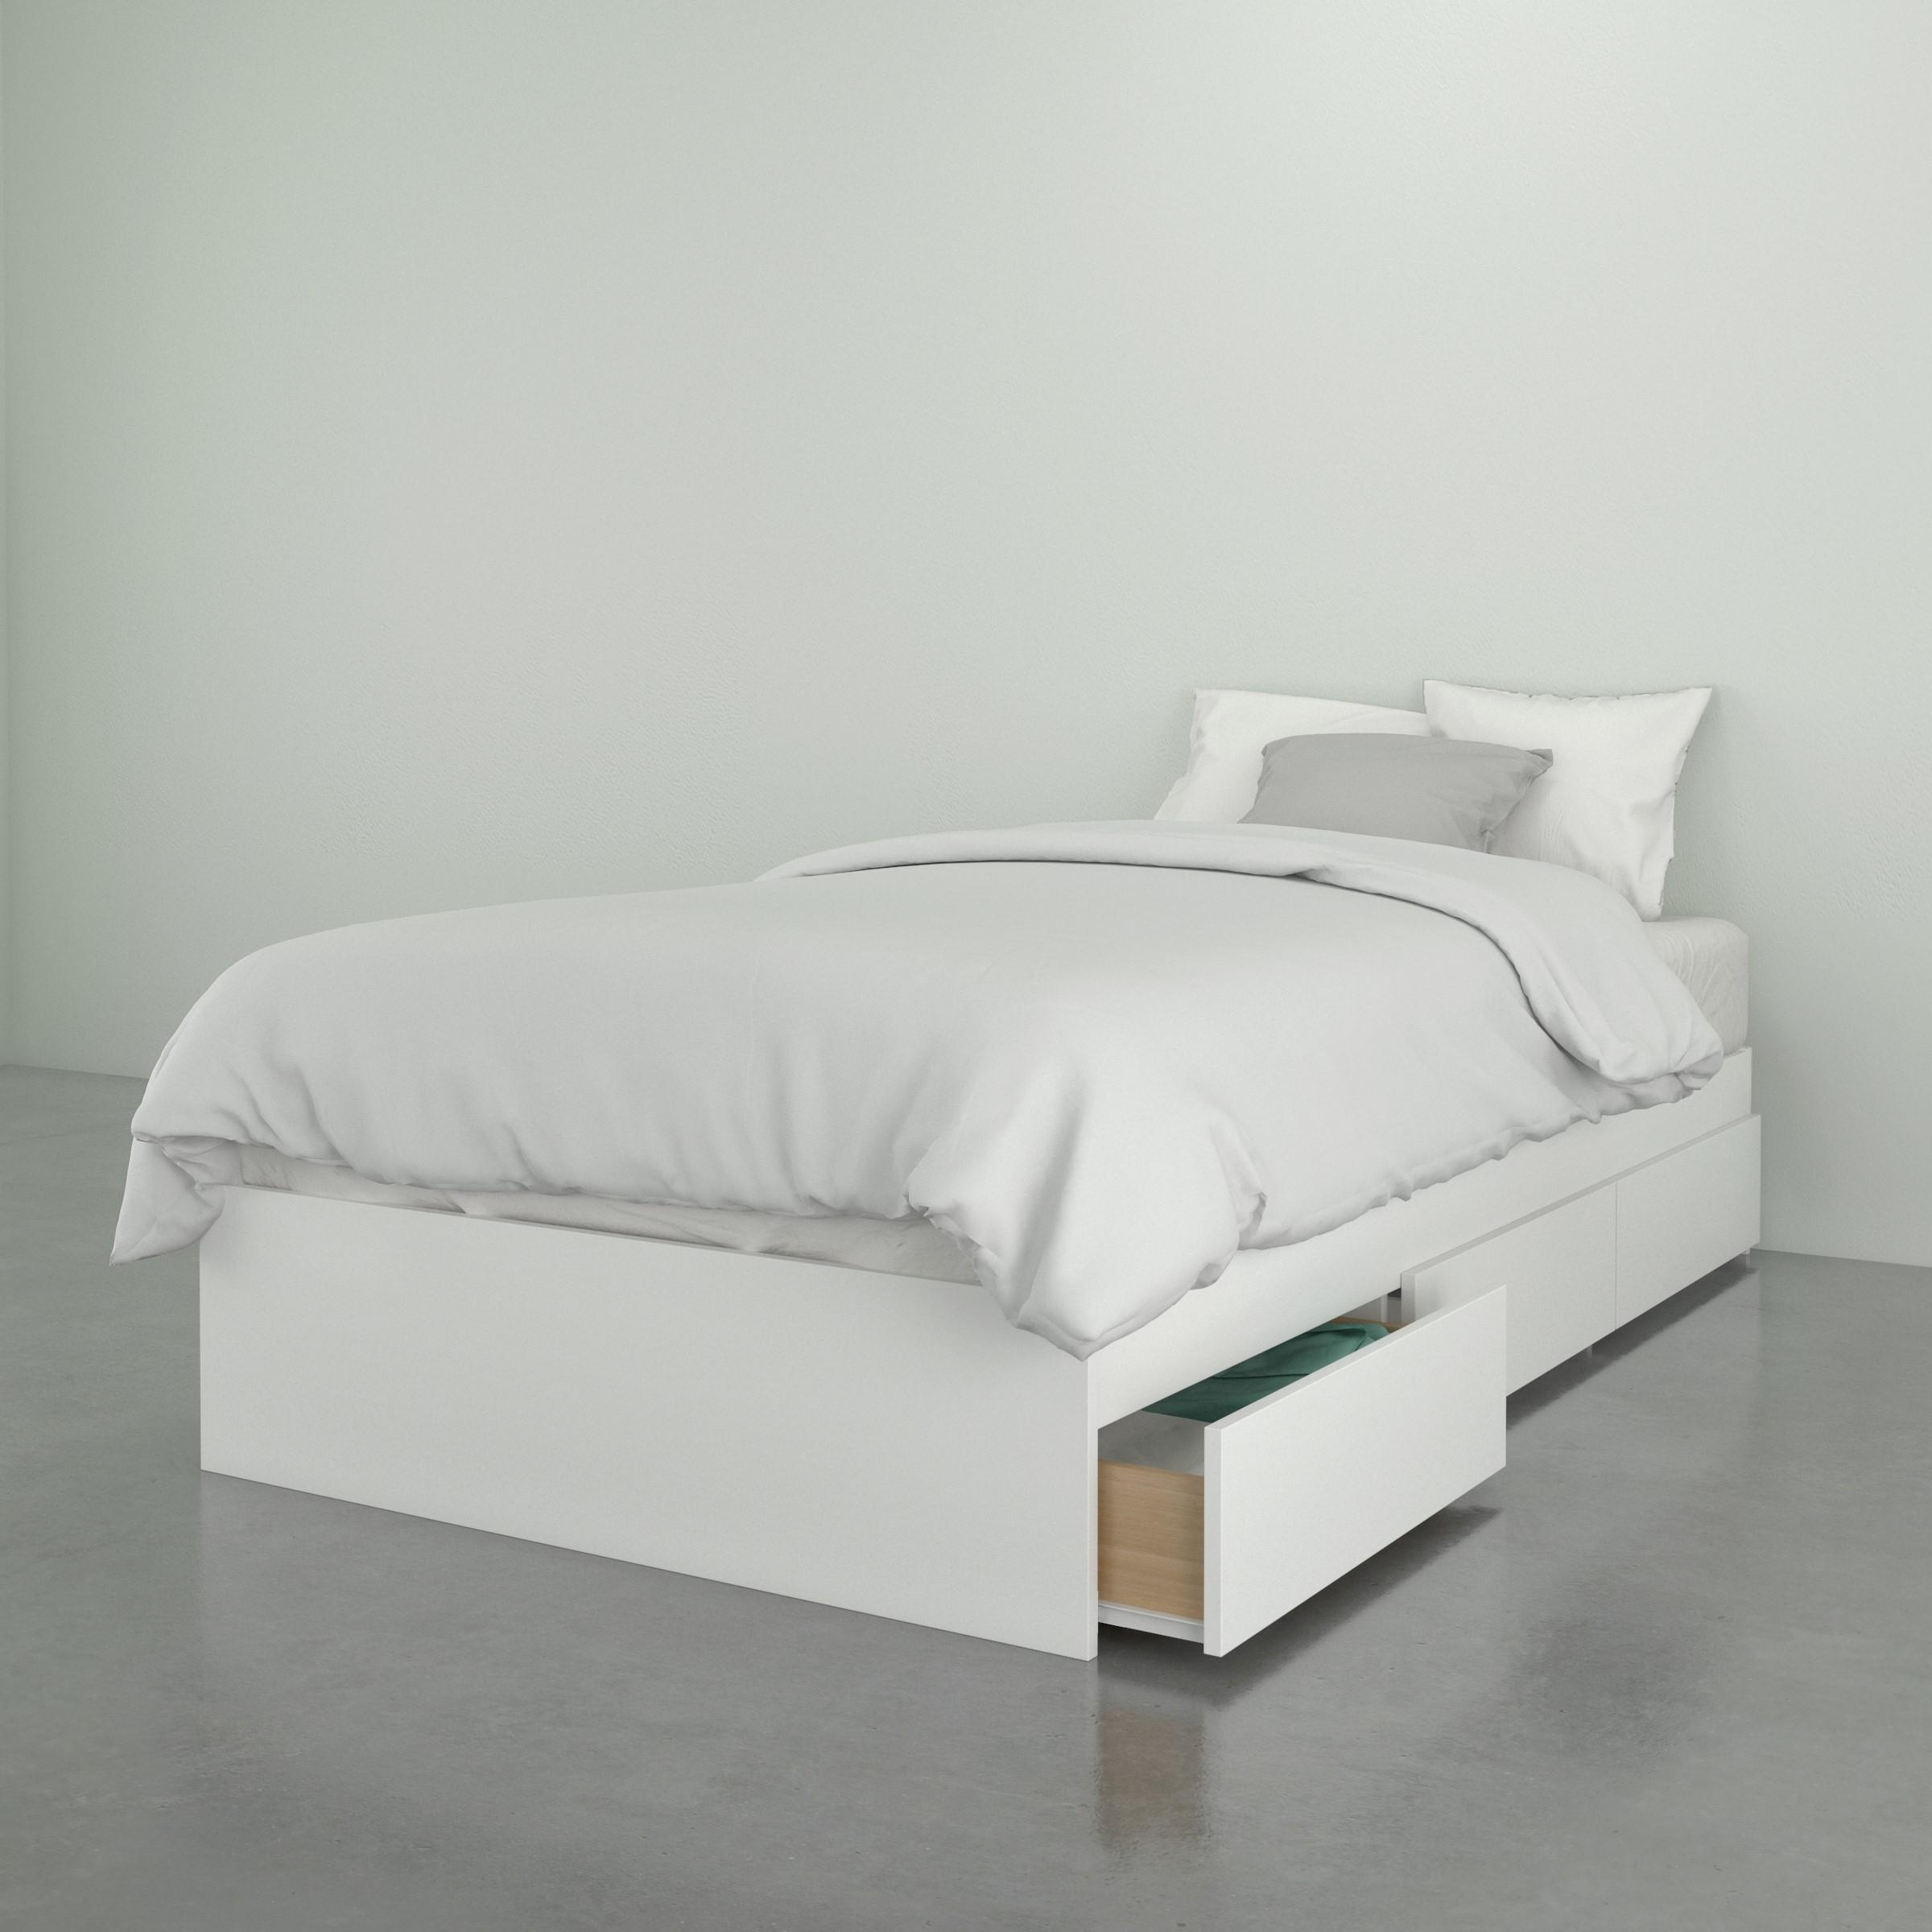 Nexera Paris Twin Size 3 Drawer Storage Bed, White